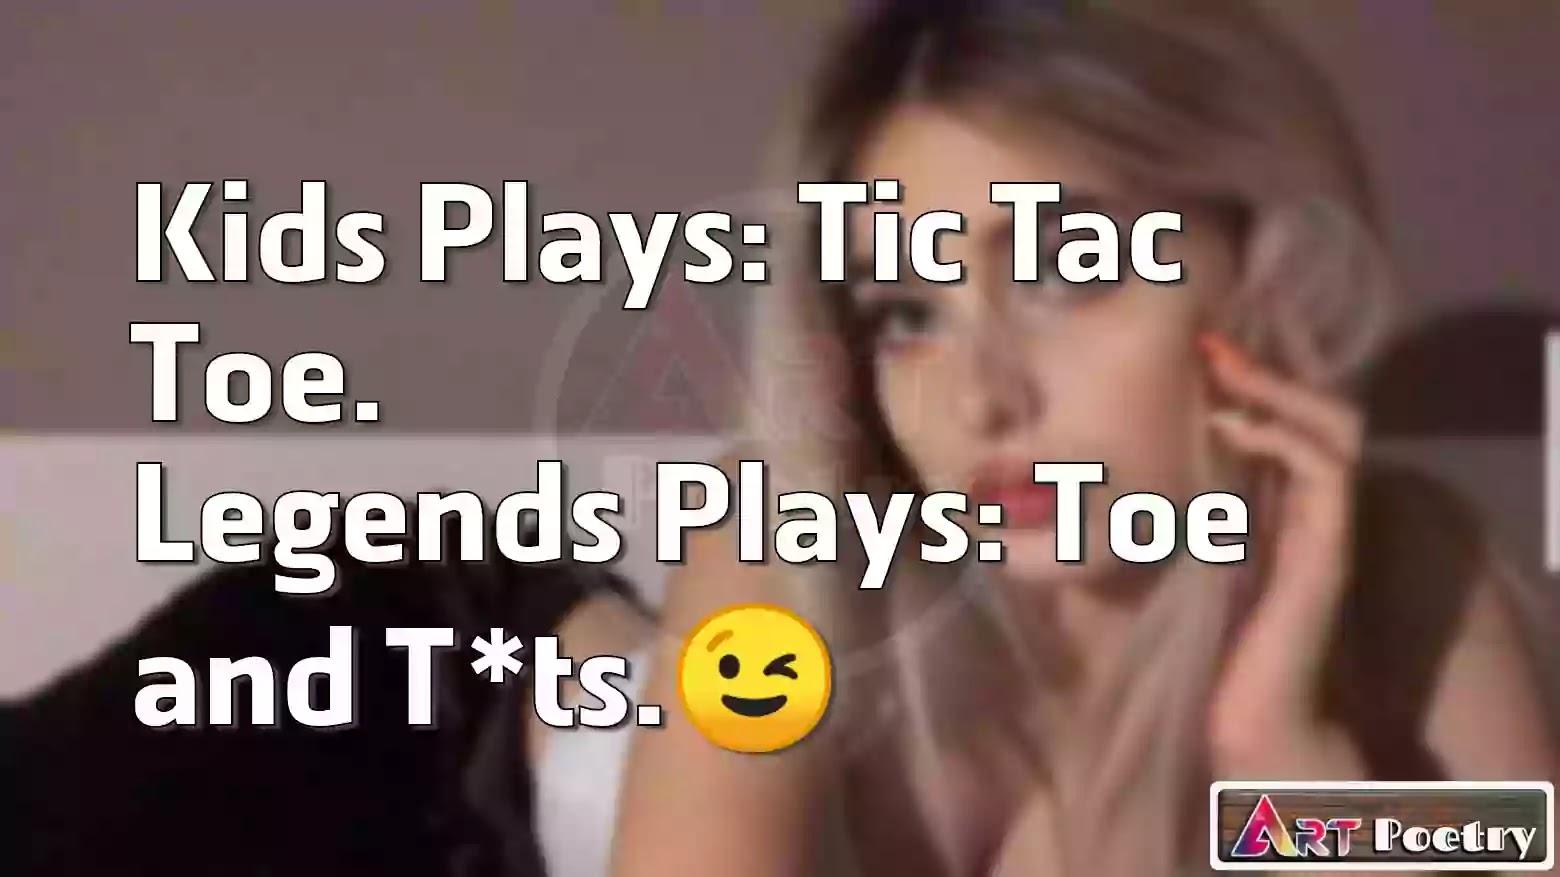 sissy caption | hentai caption | sissy caption story | sissy caption stories | sissy caption reddit | sissy captions | sissy hypno | sissy hypnosis | sissy training, Kids Plays: Tic Tac Toe. Legends Plays: Toe and Tlts.